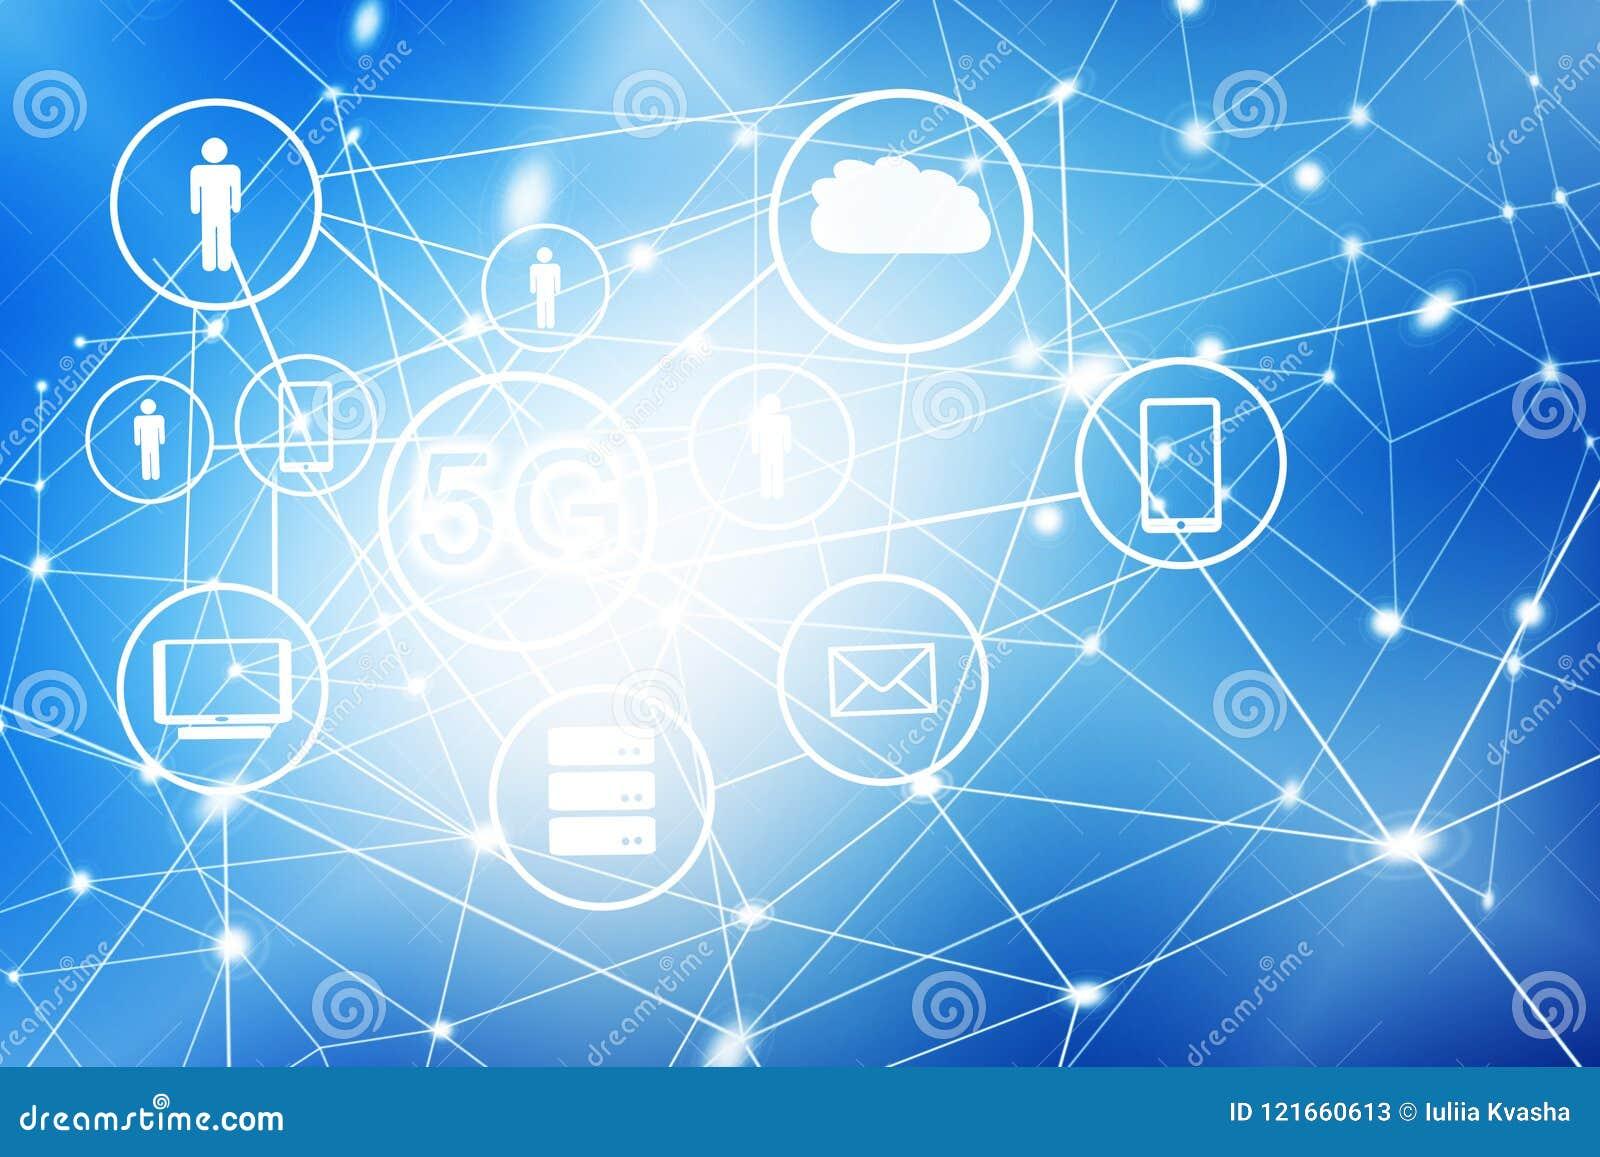 5G K Internet Mobile Wireless Concept  Best Internet Concept Of